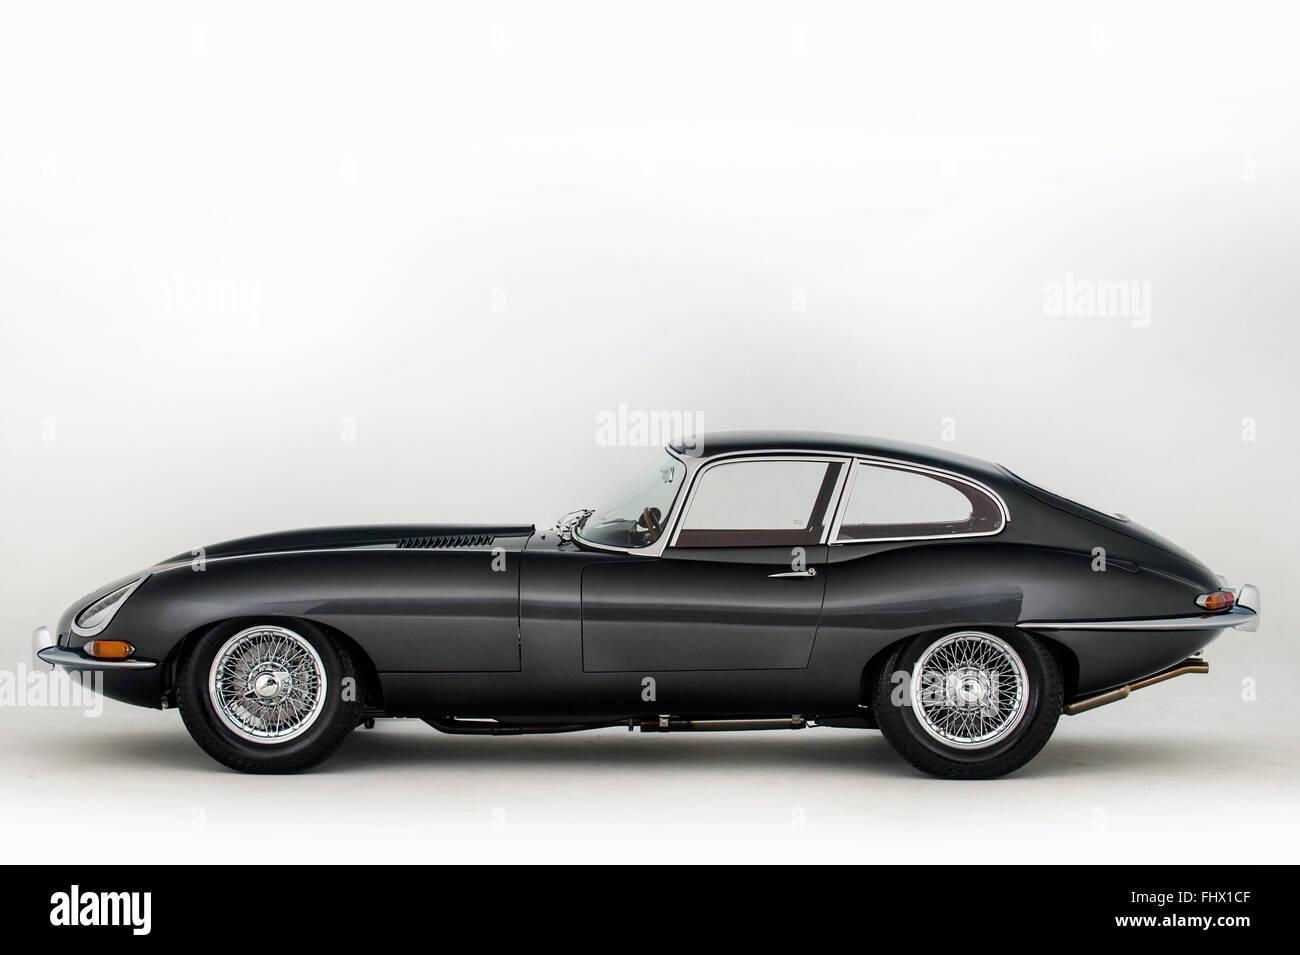 1965 Jaguar E type Imagen De Stock